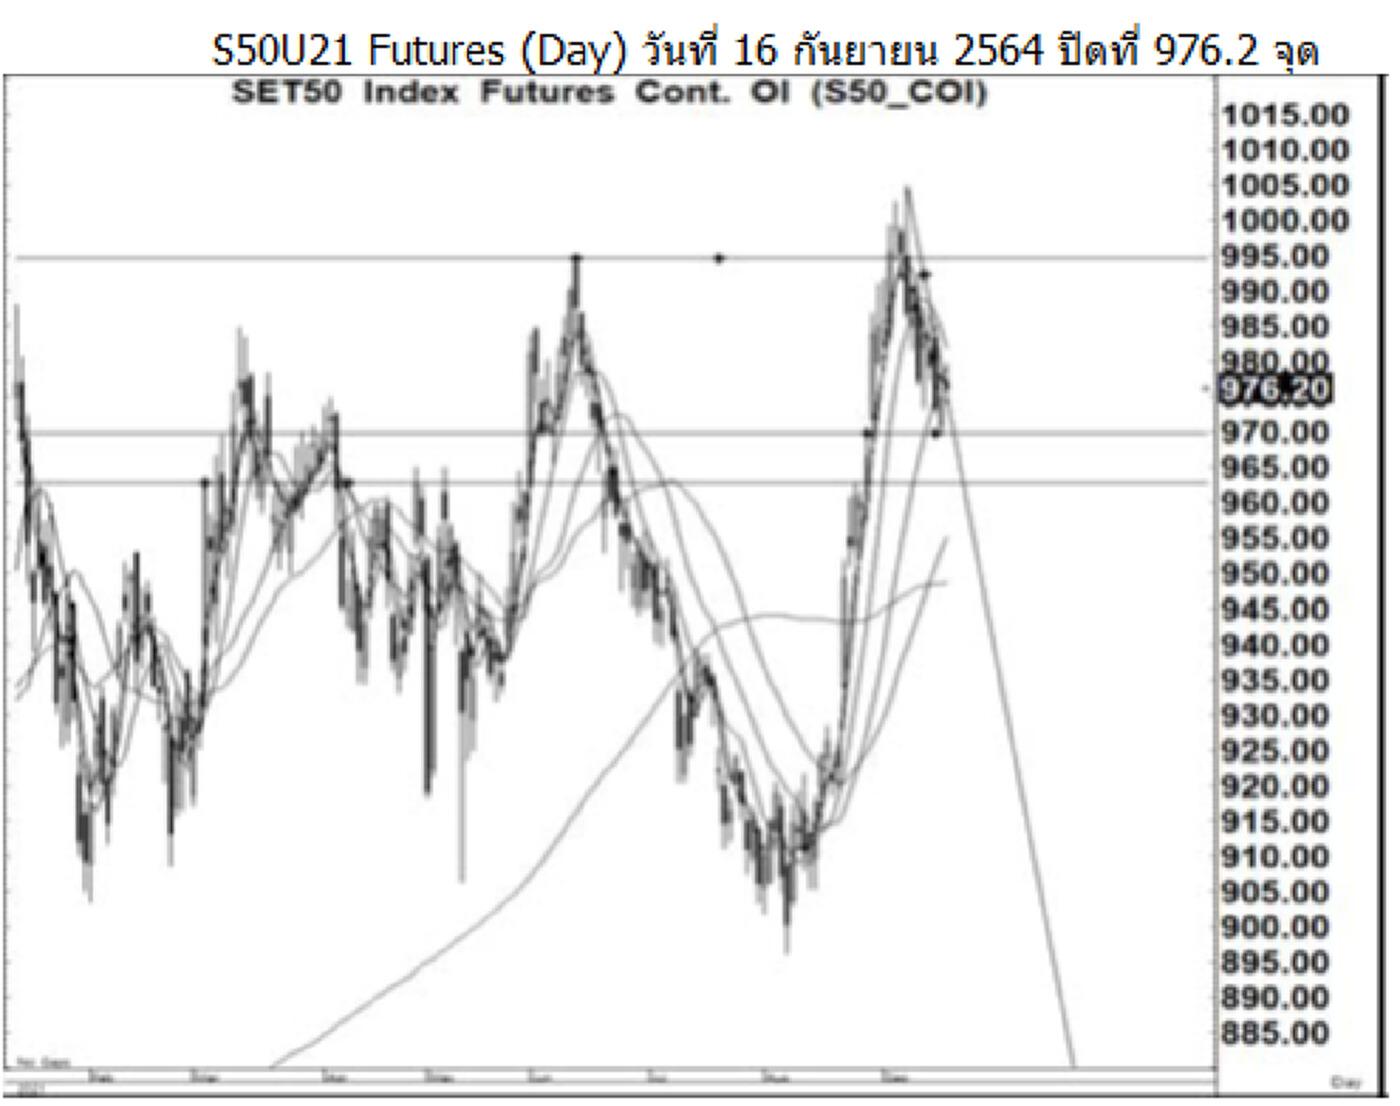 Daily SET50 Futures (วันที่ 17 กันยายน 2564)